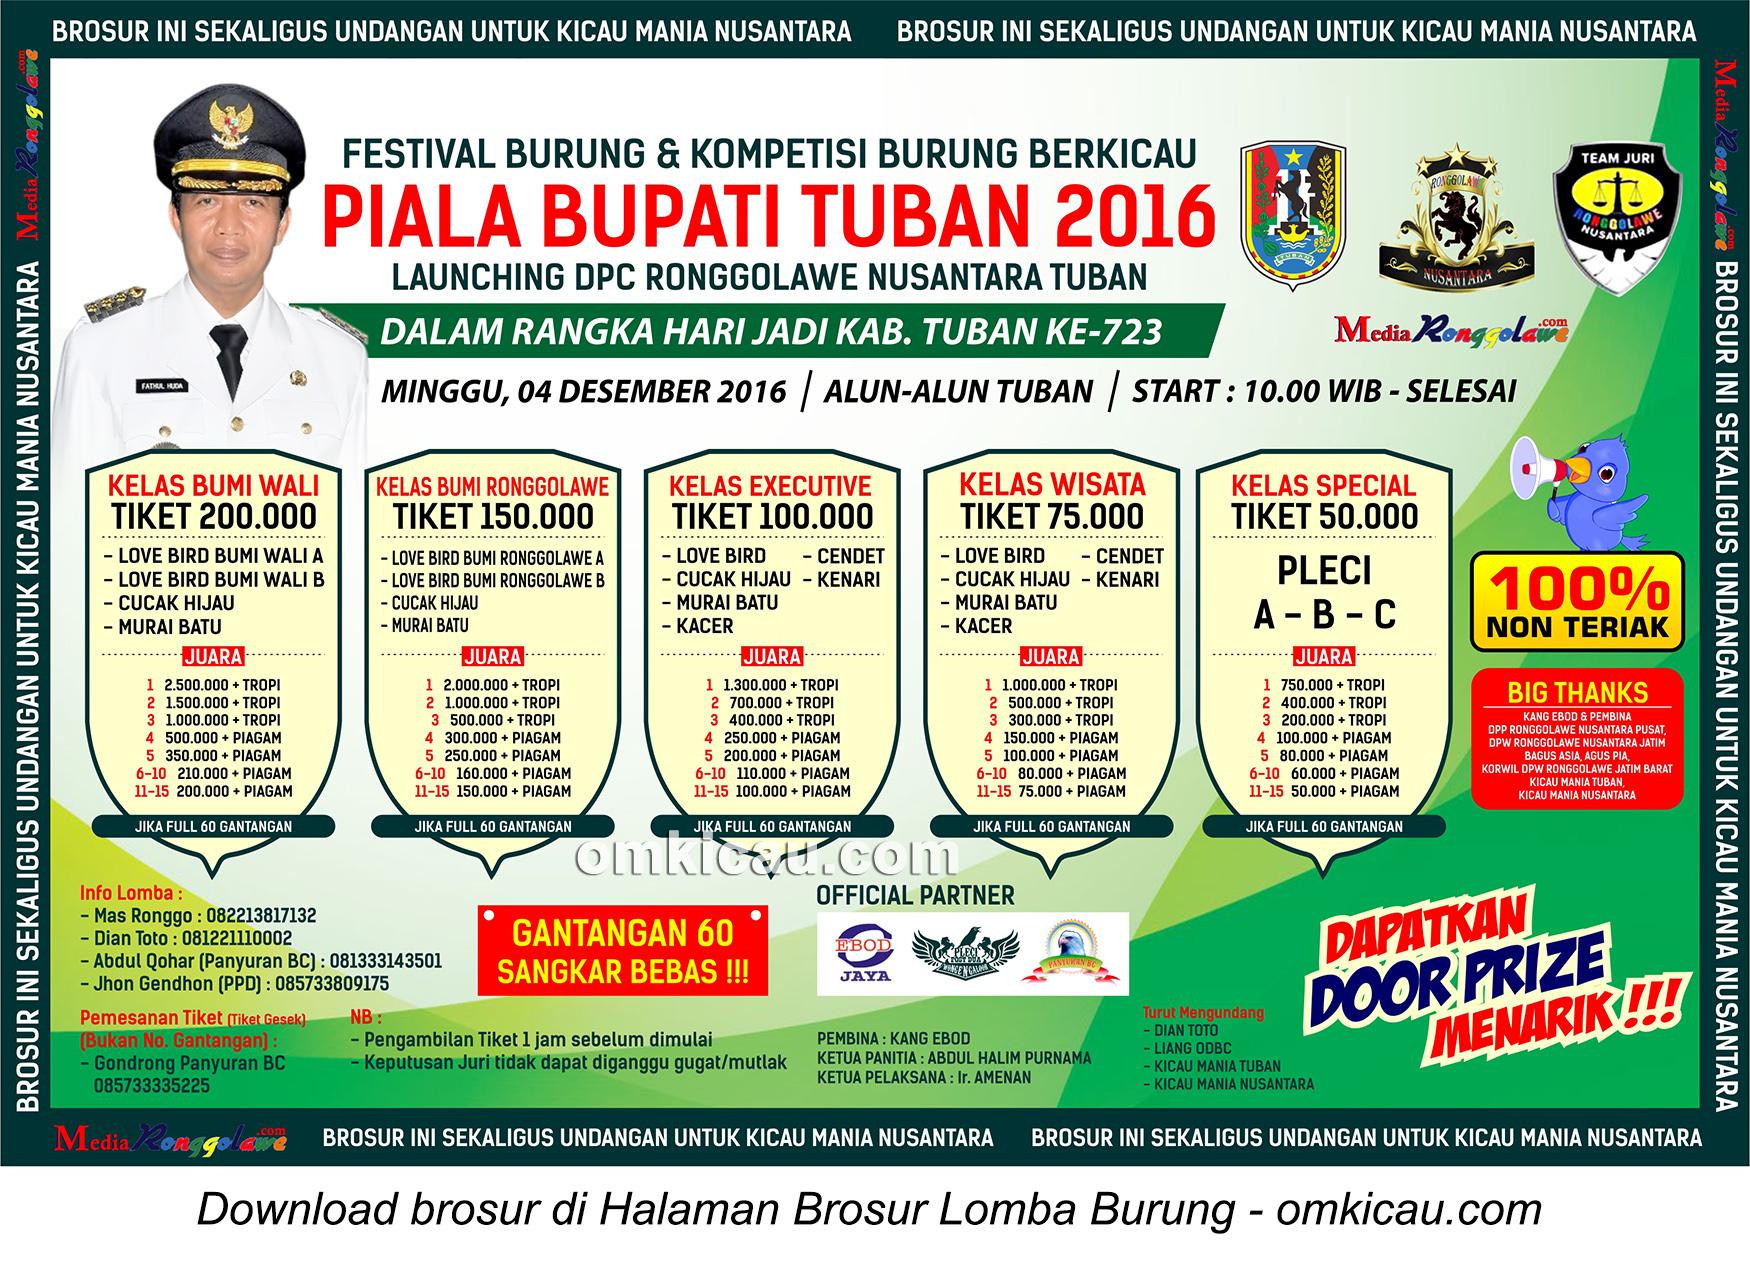 Brosur Terbaru Lomba Burung Berkicau Piala Bupati Tuban, 4 Desember 2016